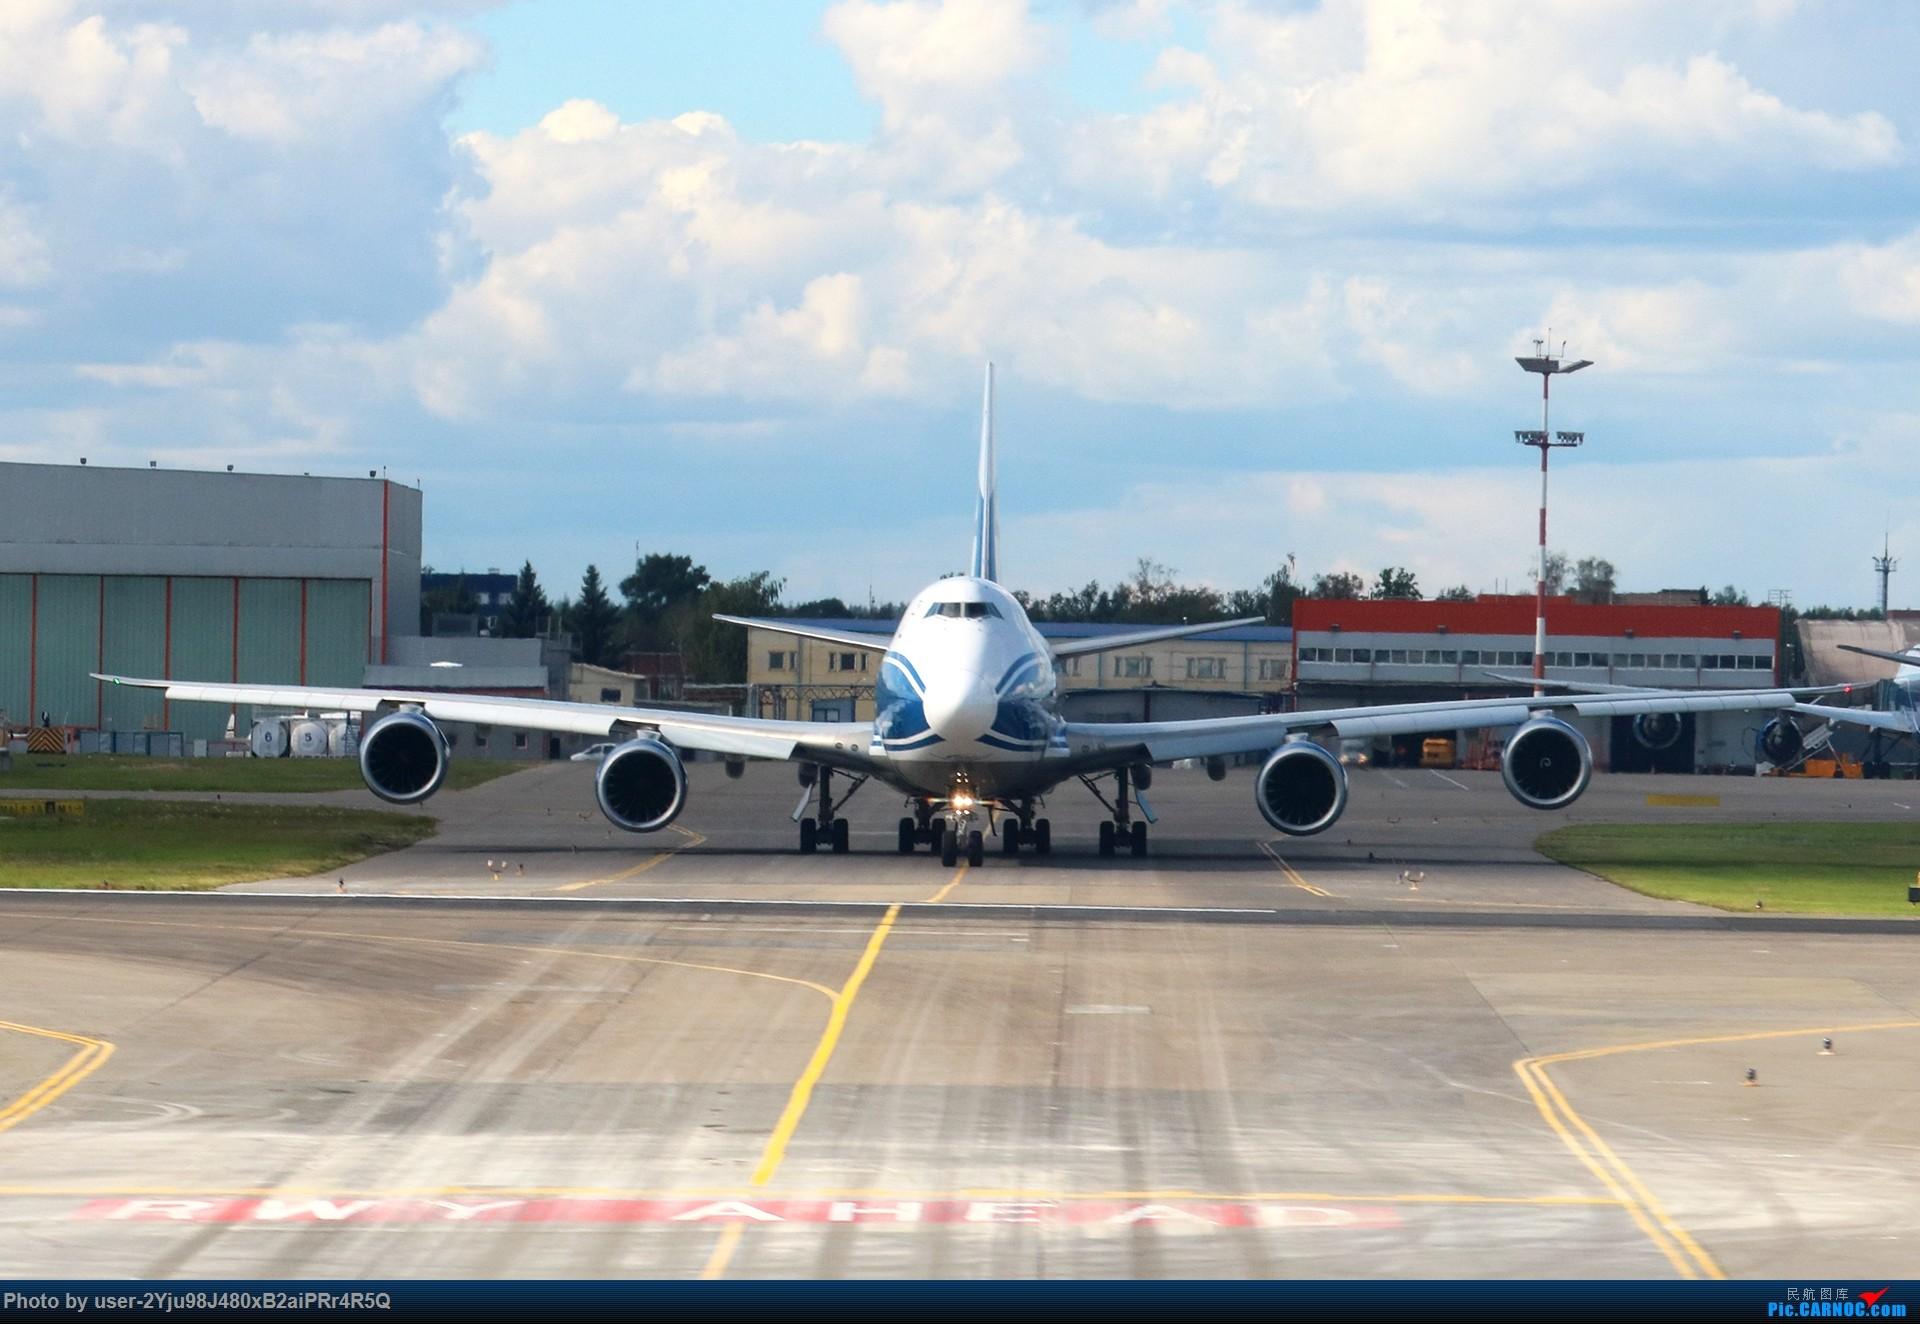 Re:[原创]LIULIU|Sheremetyevo的漫游|俄罗斯空桥货运 BOEING 747-8F  俄罗斯谢诺梅杰沃机场